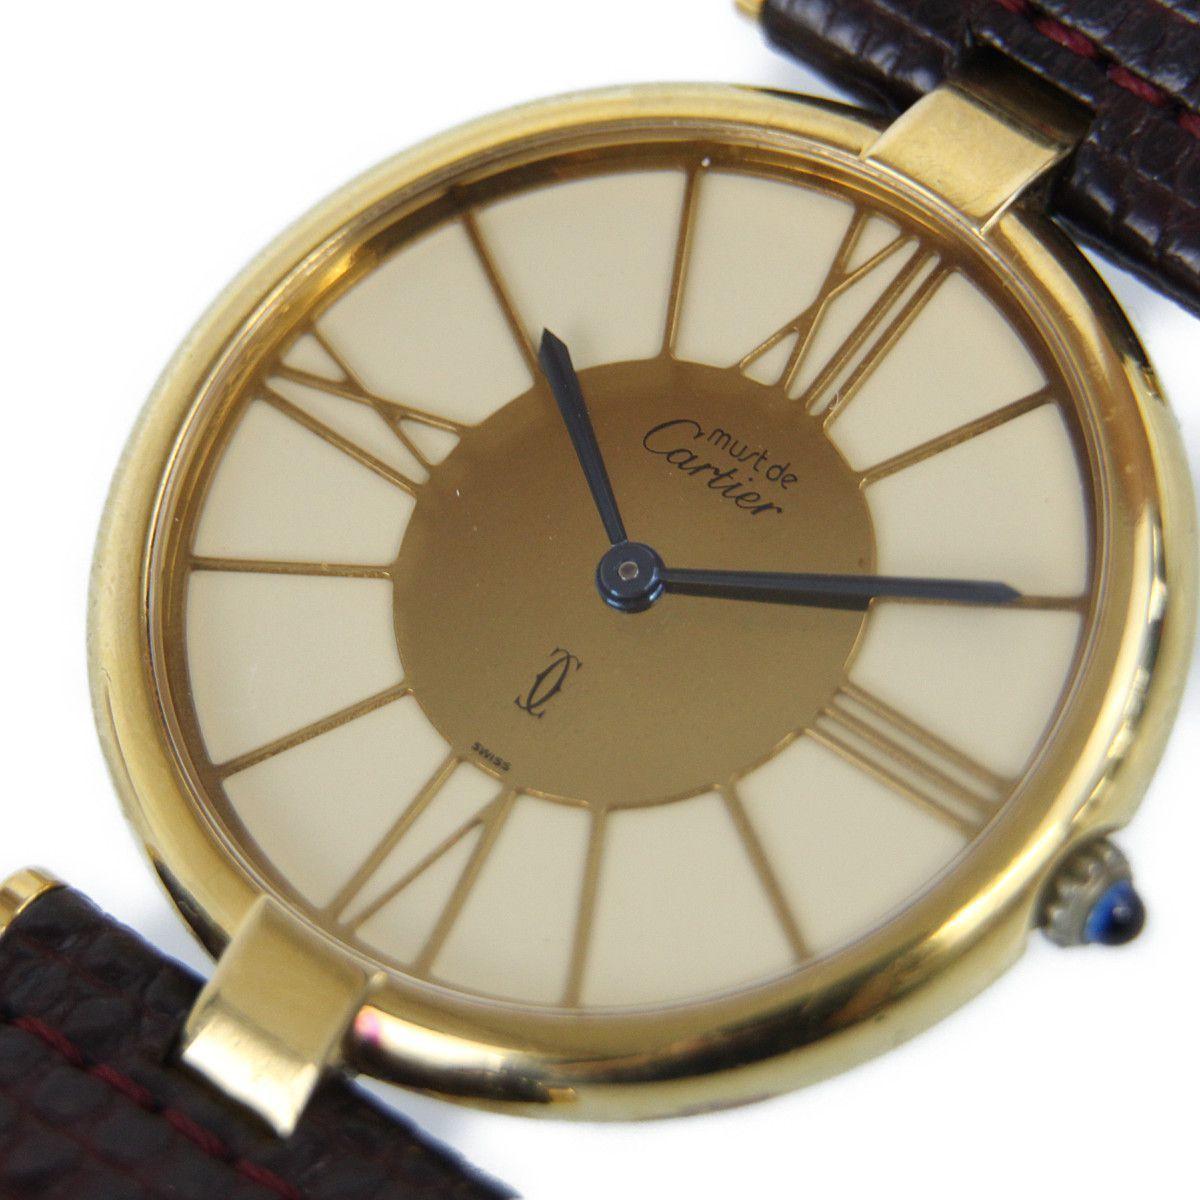 e659399e01ff 1円~ Cartier カルティエ マストヴァンドーム ヴェルメイユ レディース腕時計 クオーツ 女性用 【中古